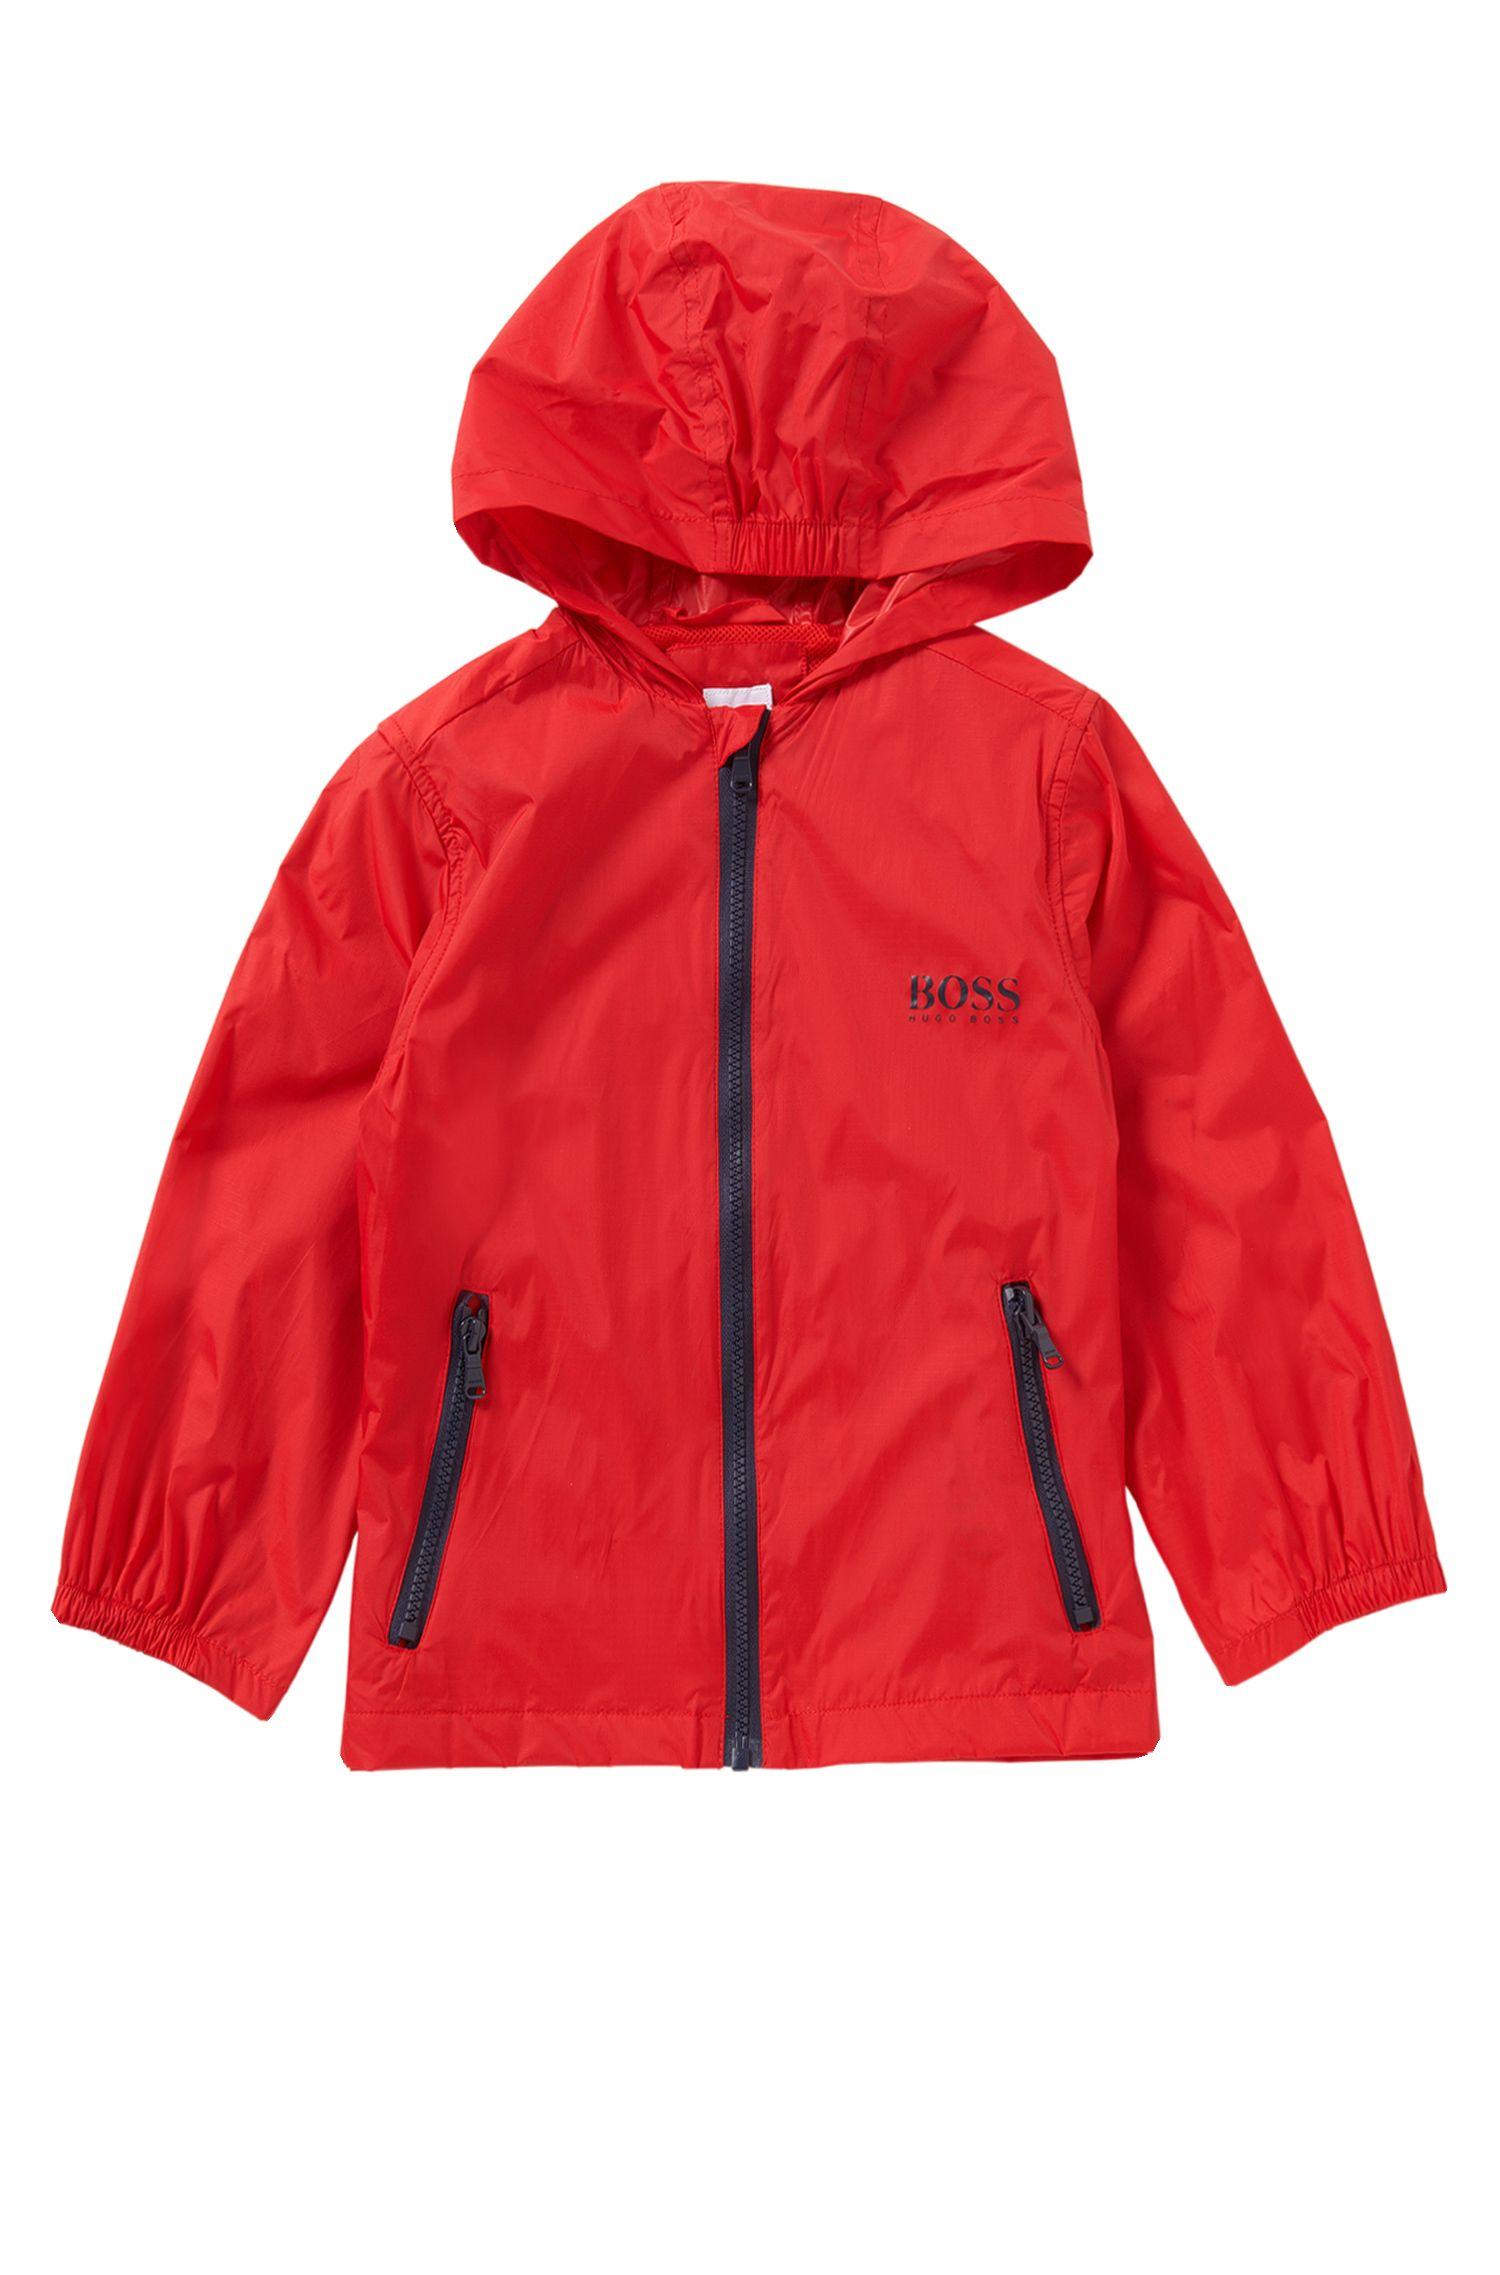 Kids' jacket in stretch cotton blend: 'J26280'